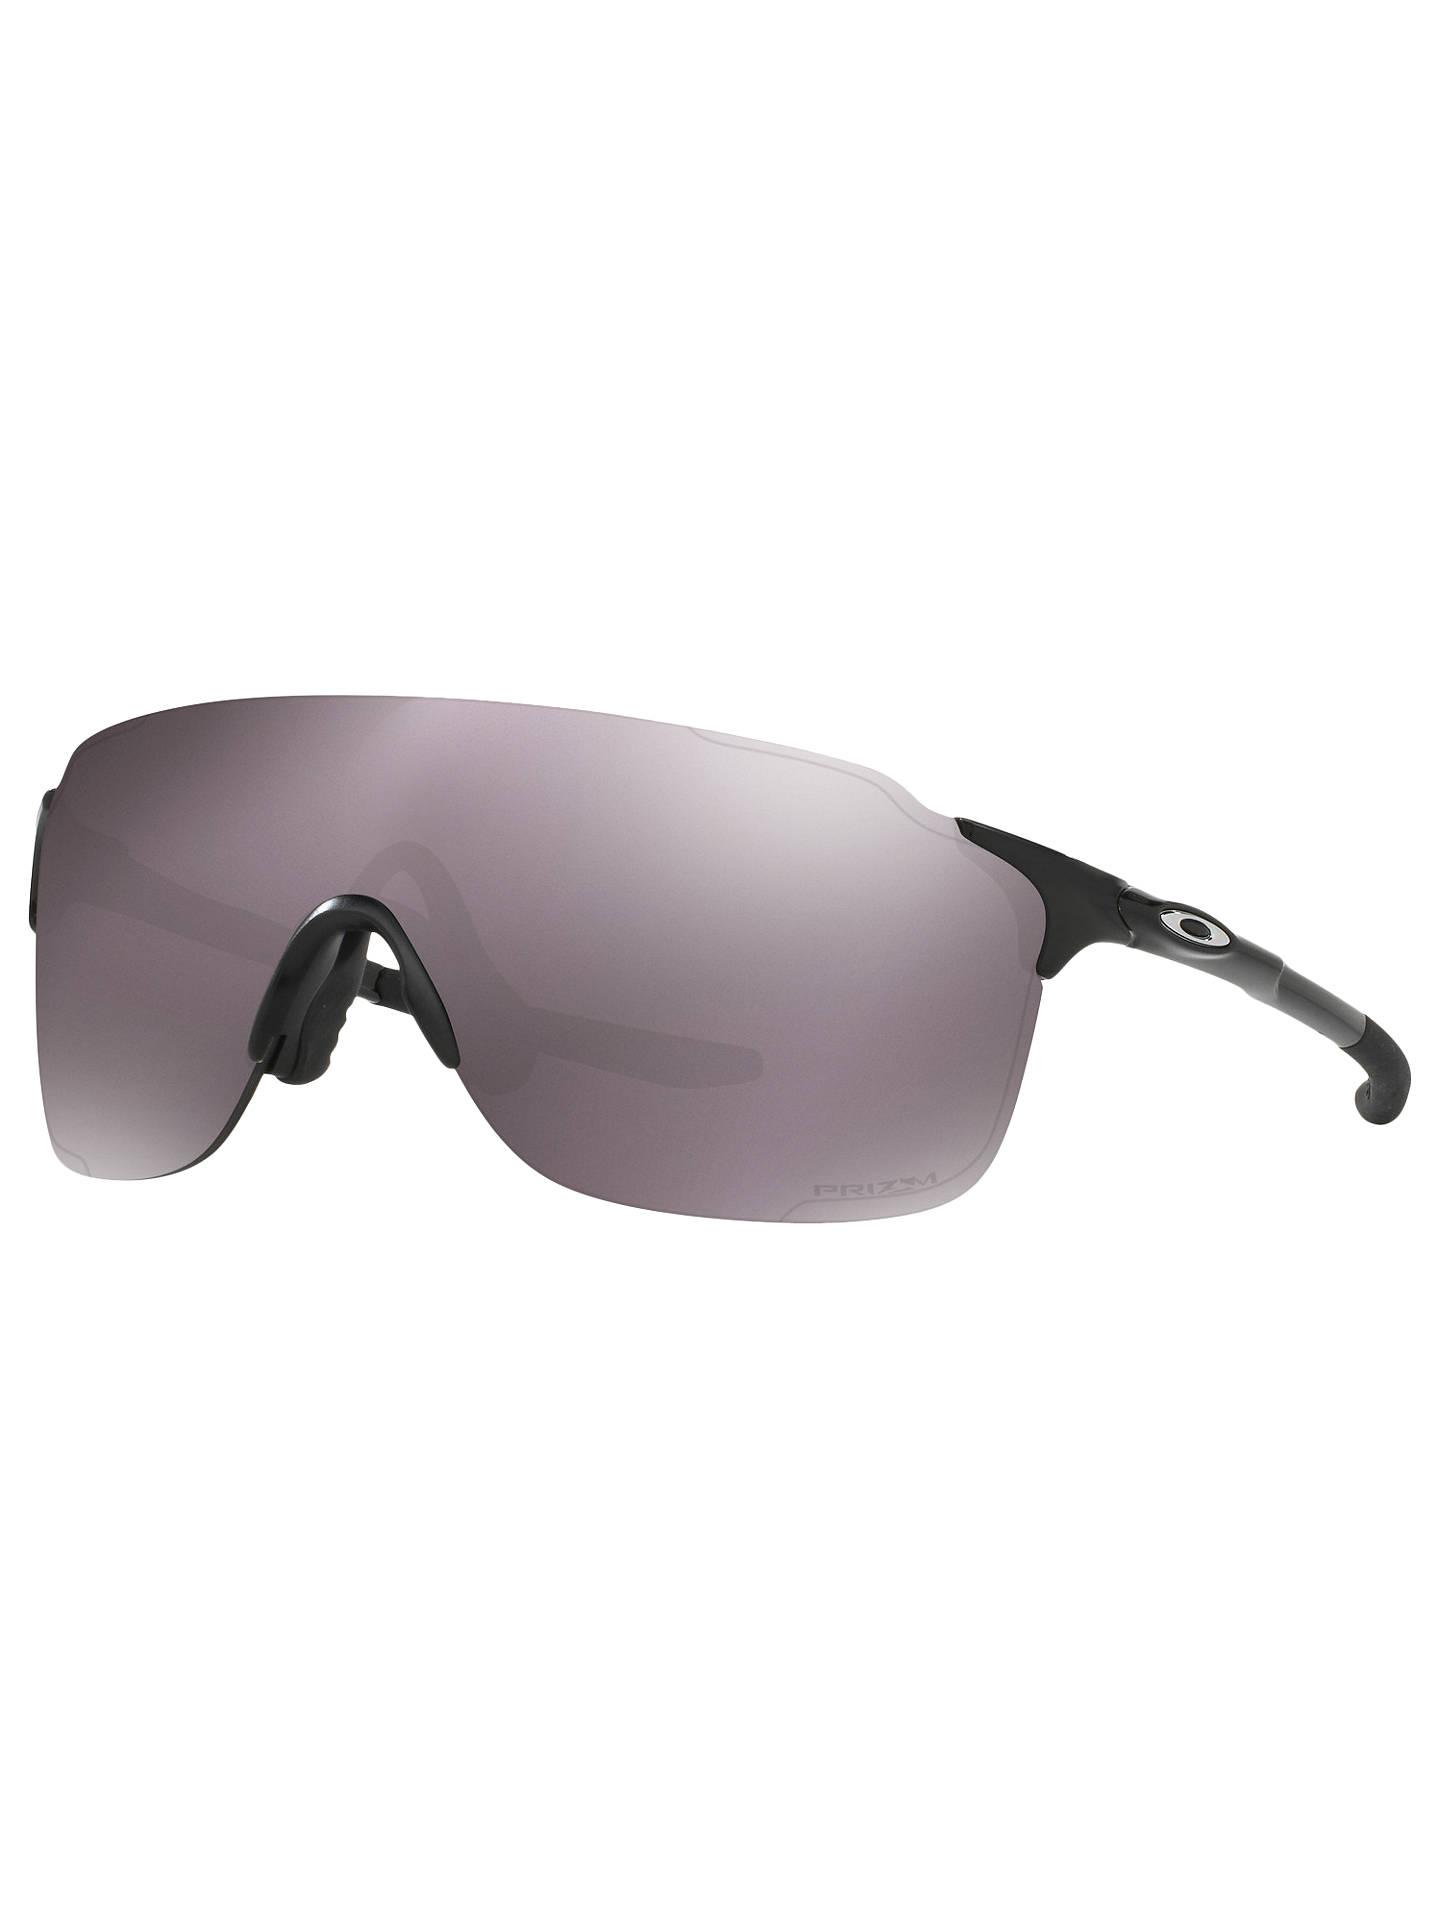 6d5fbecb8a ... sale buyoakley oo9386 polarised evzero stride prizm rectangular  sunglasses polished black mirror beige online at 5fc5f low cost oakley ...